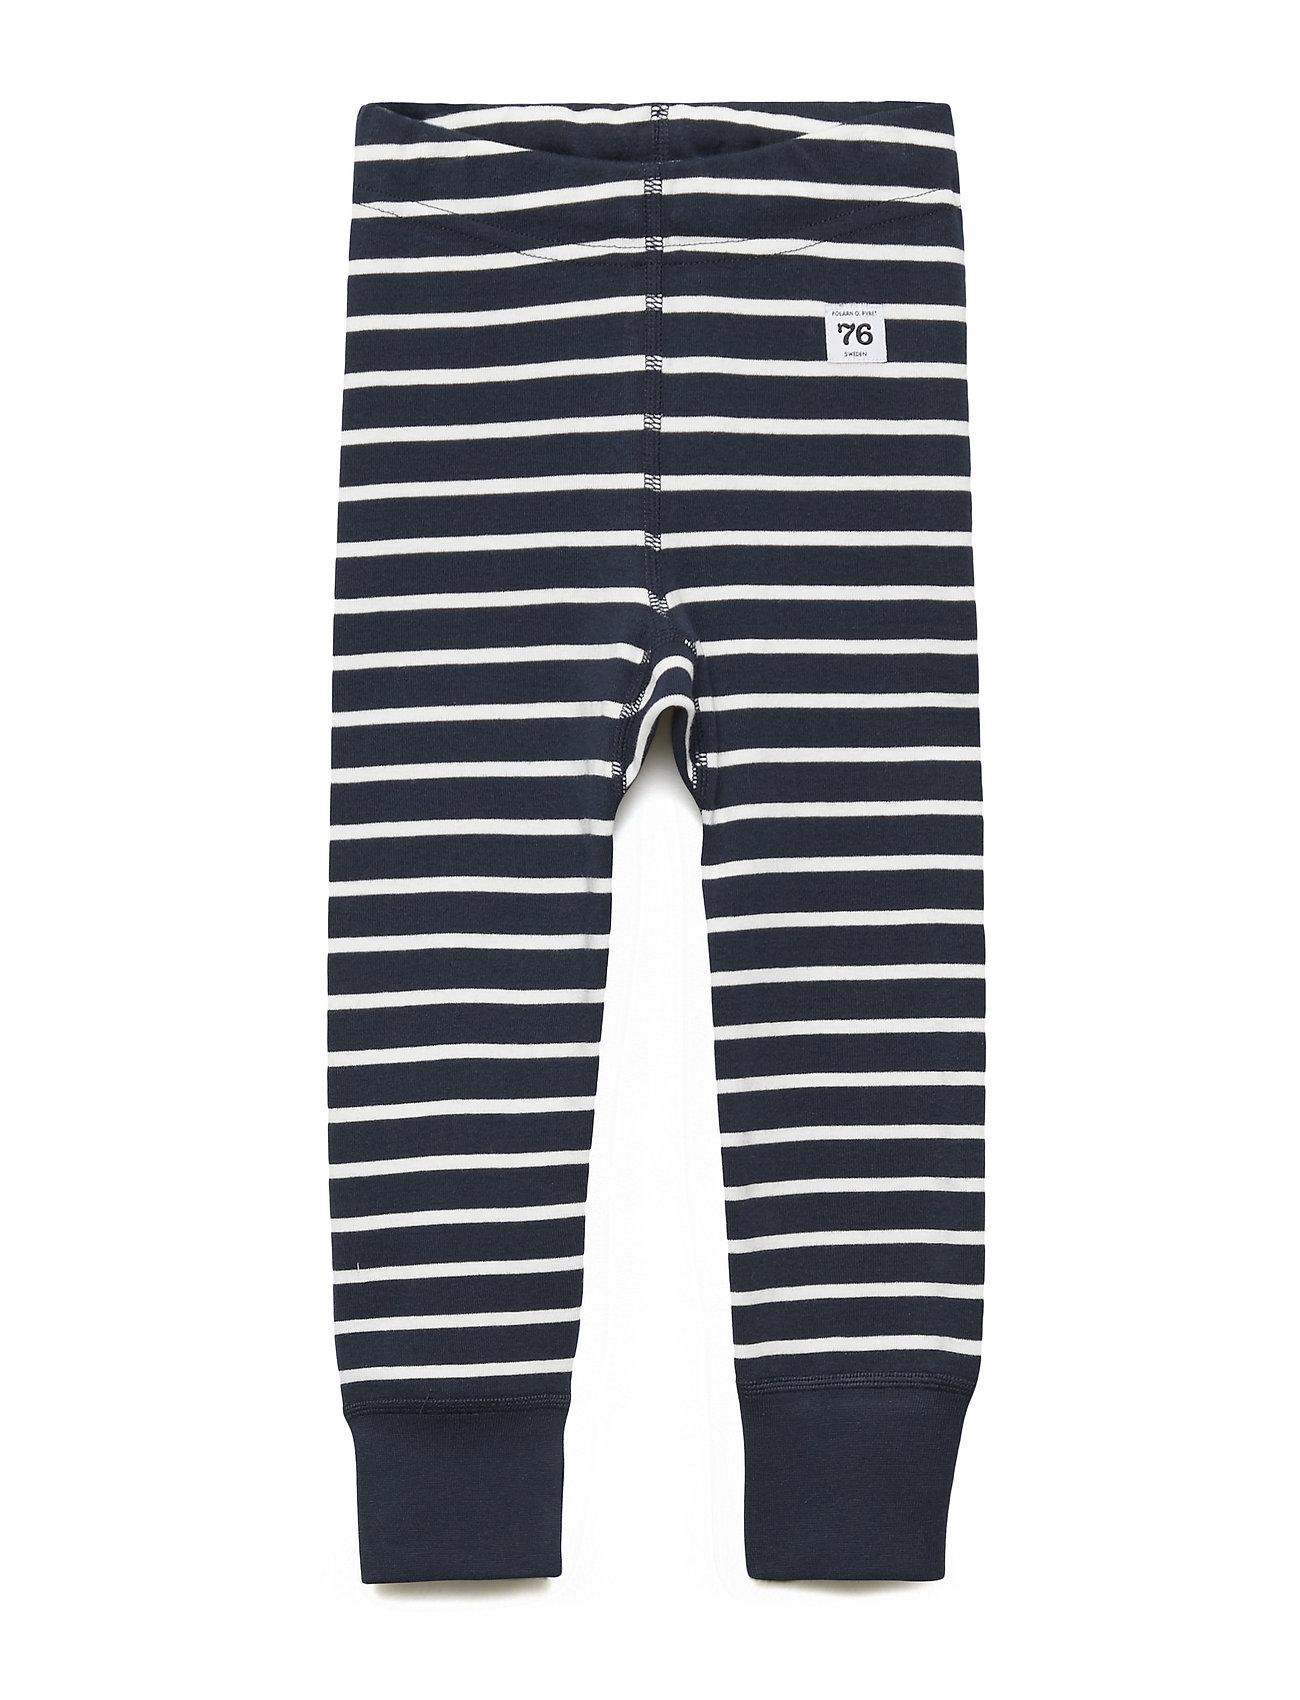 Polarn O. Pyret Long Johns PO.P Stripe Baby